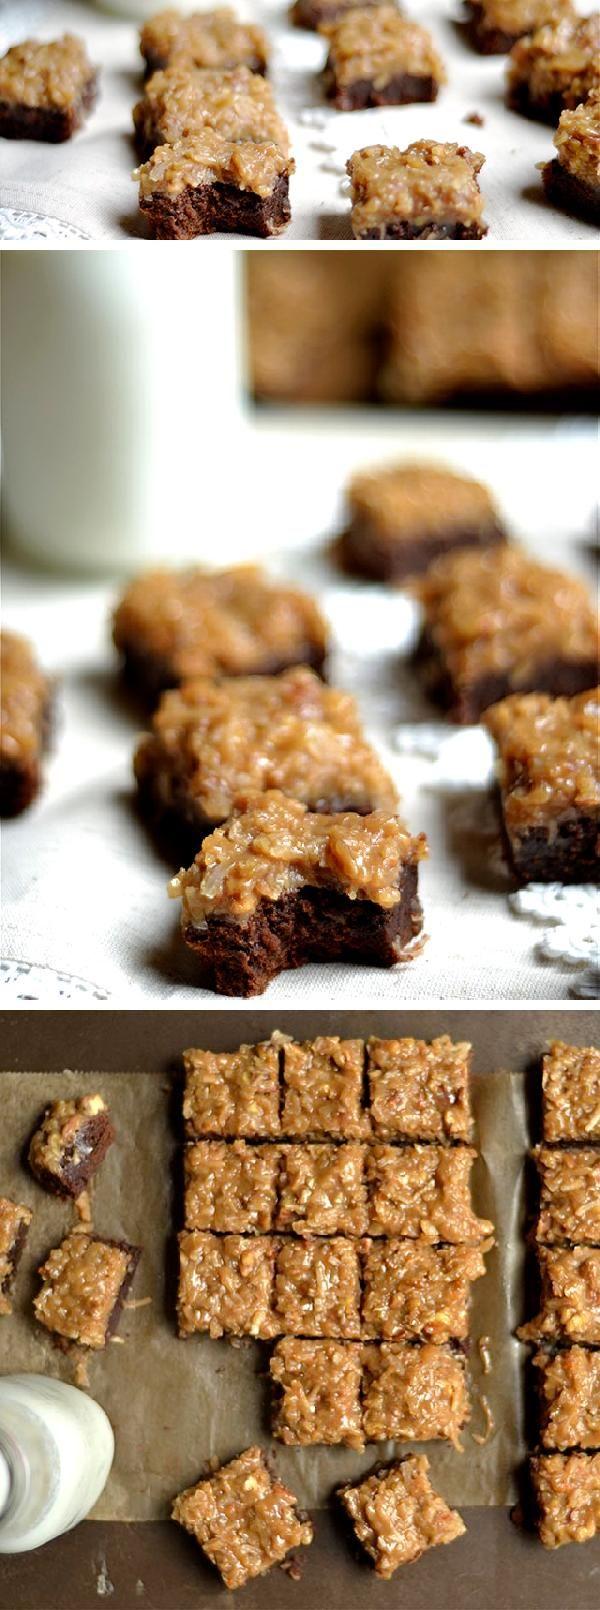 Best 25+ German chocolate brownies ideas only on Pinterest ...